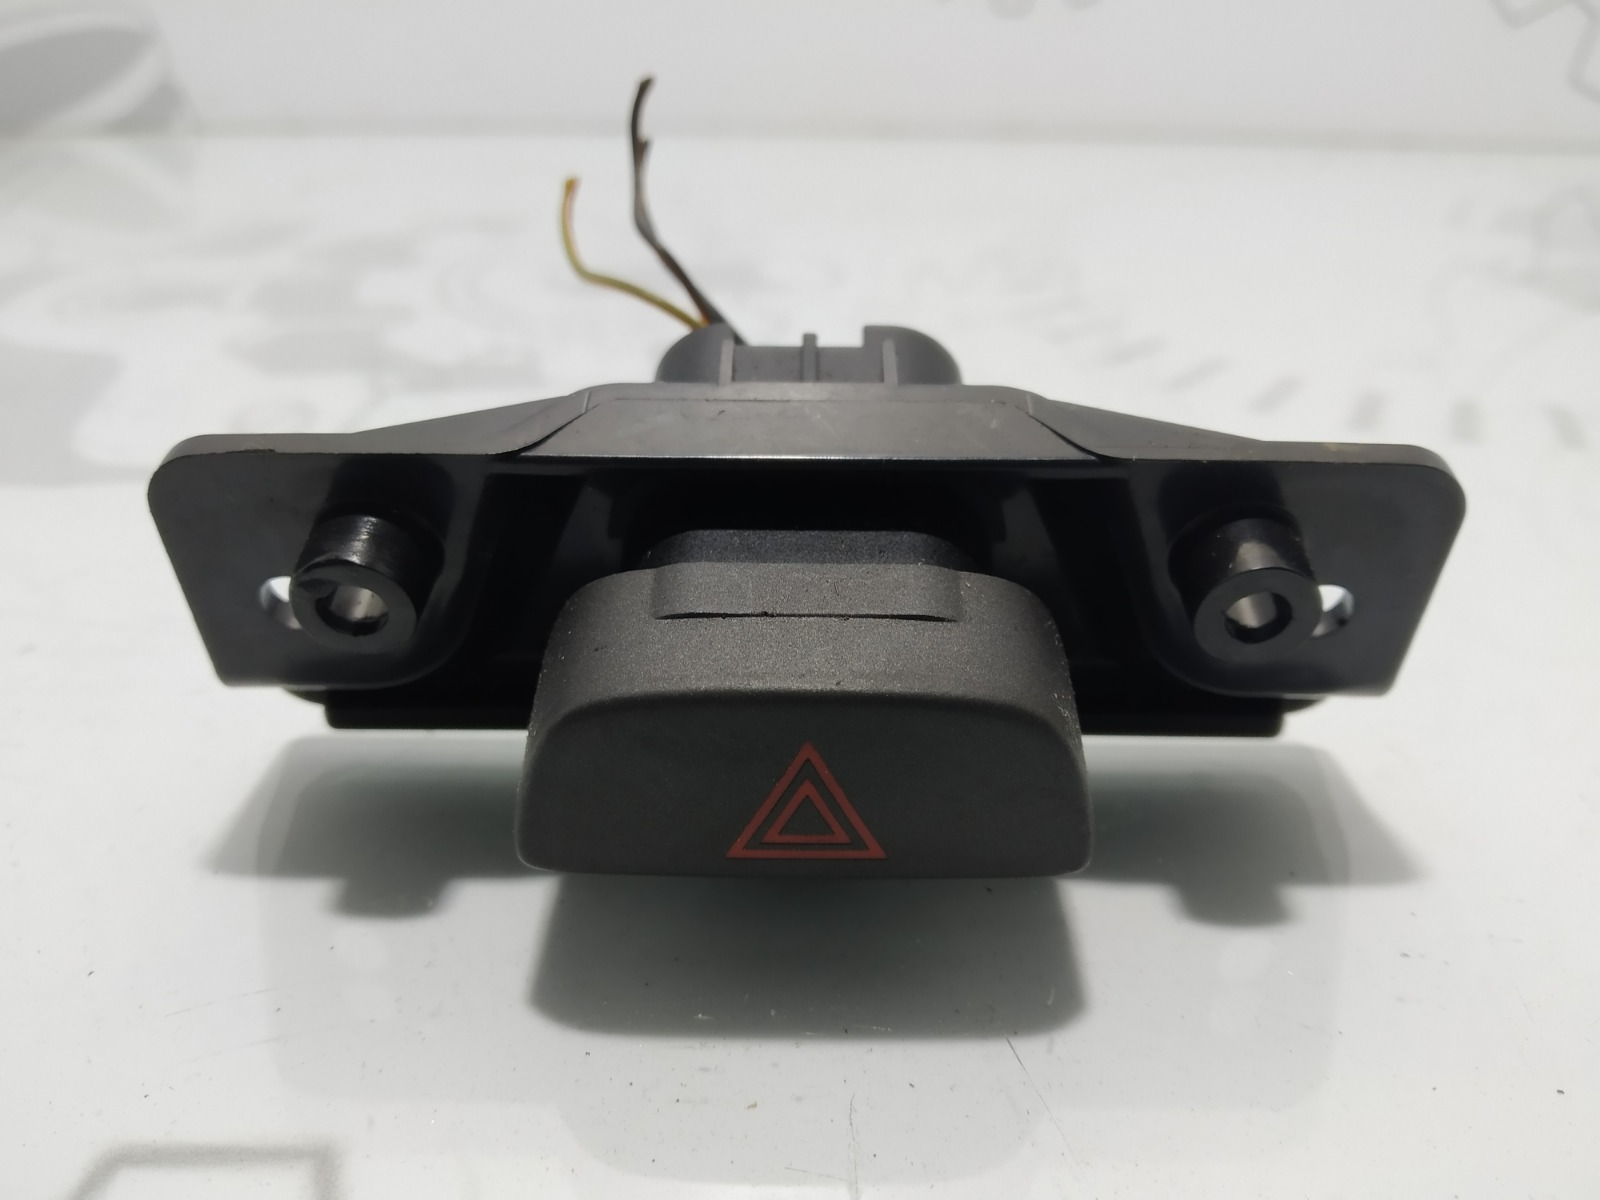 Кнопка аварийной сигнализации Ford Fiesta 1.4 CDTI 2007 (б/у)